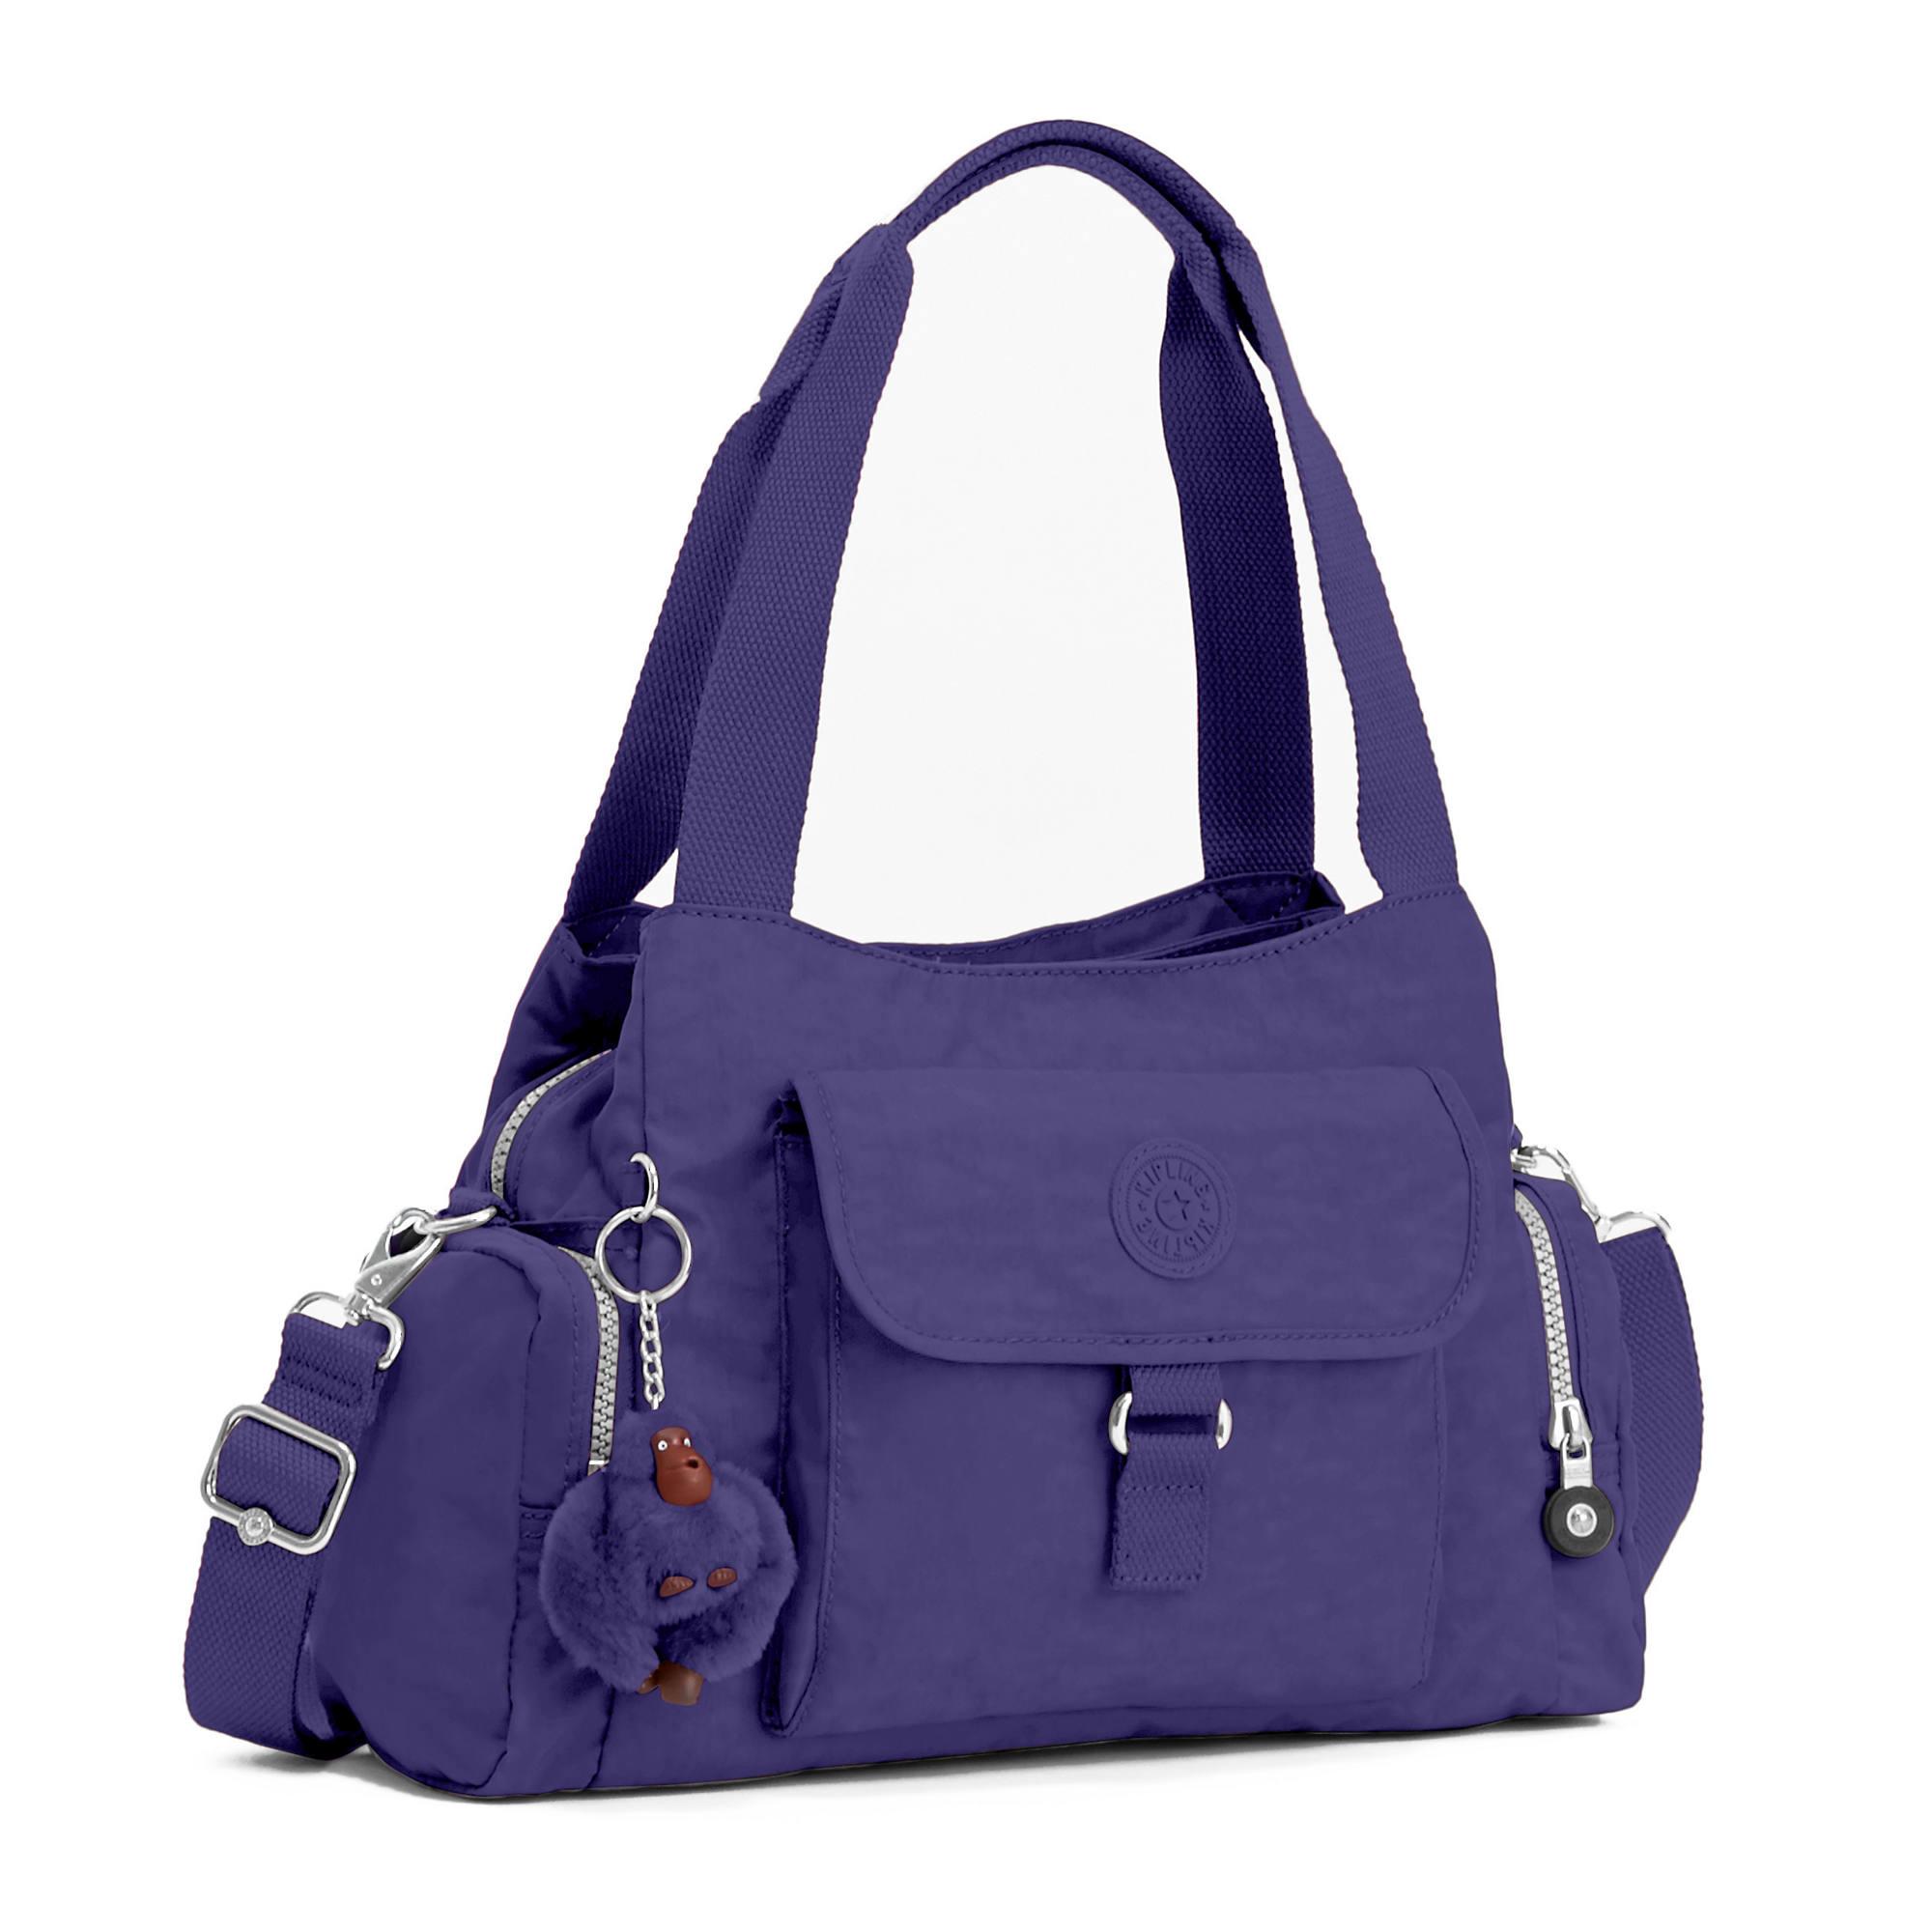 Kipling-Felix-Large-Handbag miniatura 5